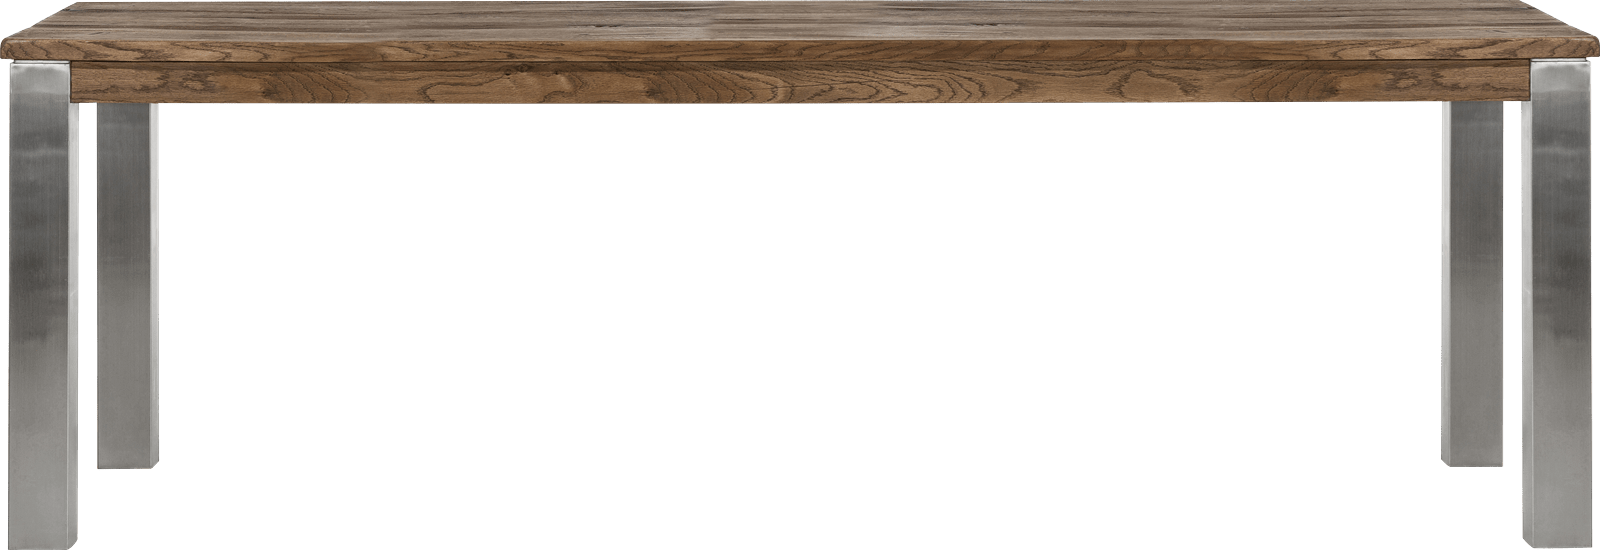 Masters - eetkamertafel 240 x 100 cm - rvs 9x9